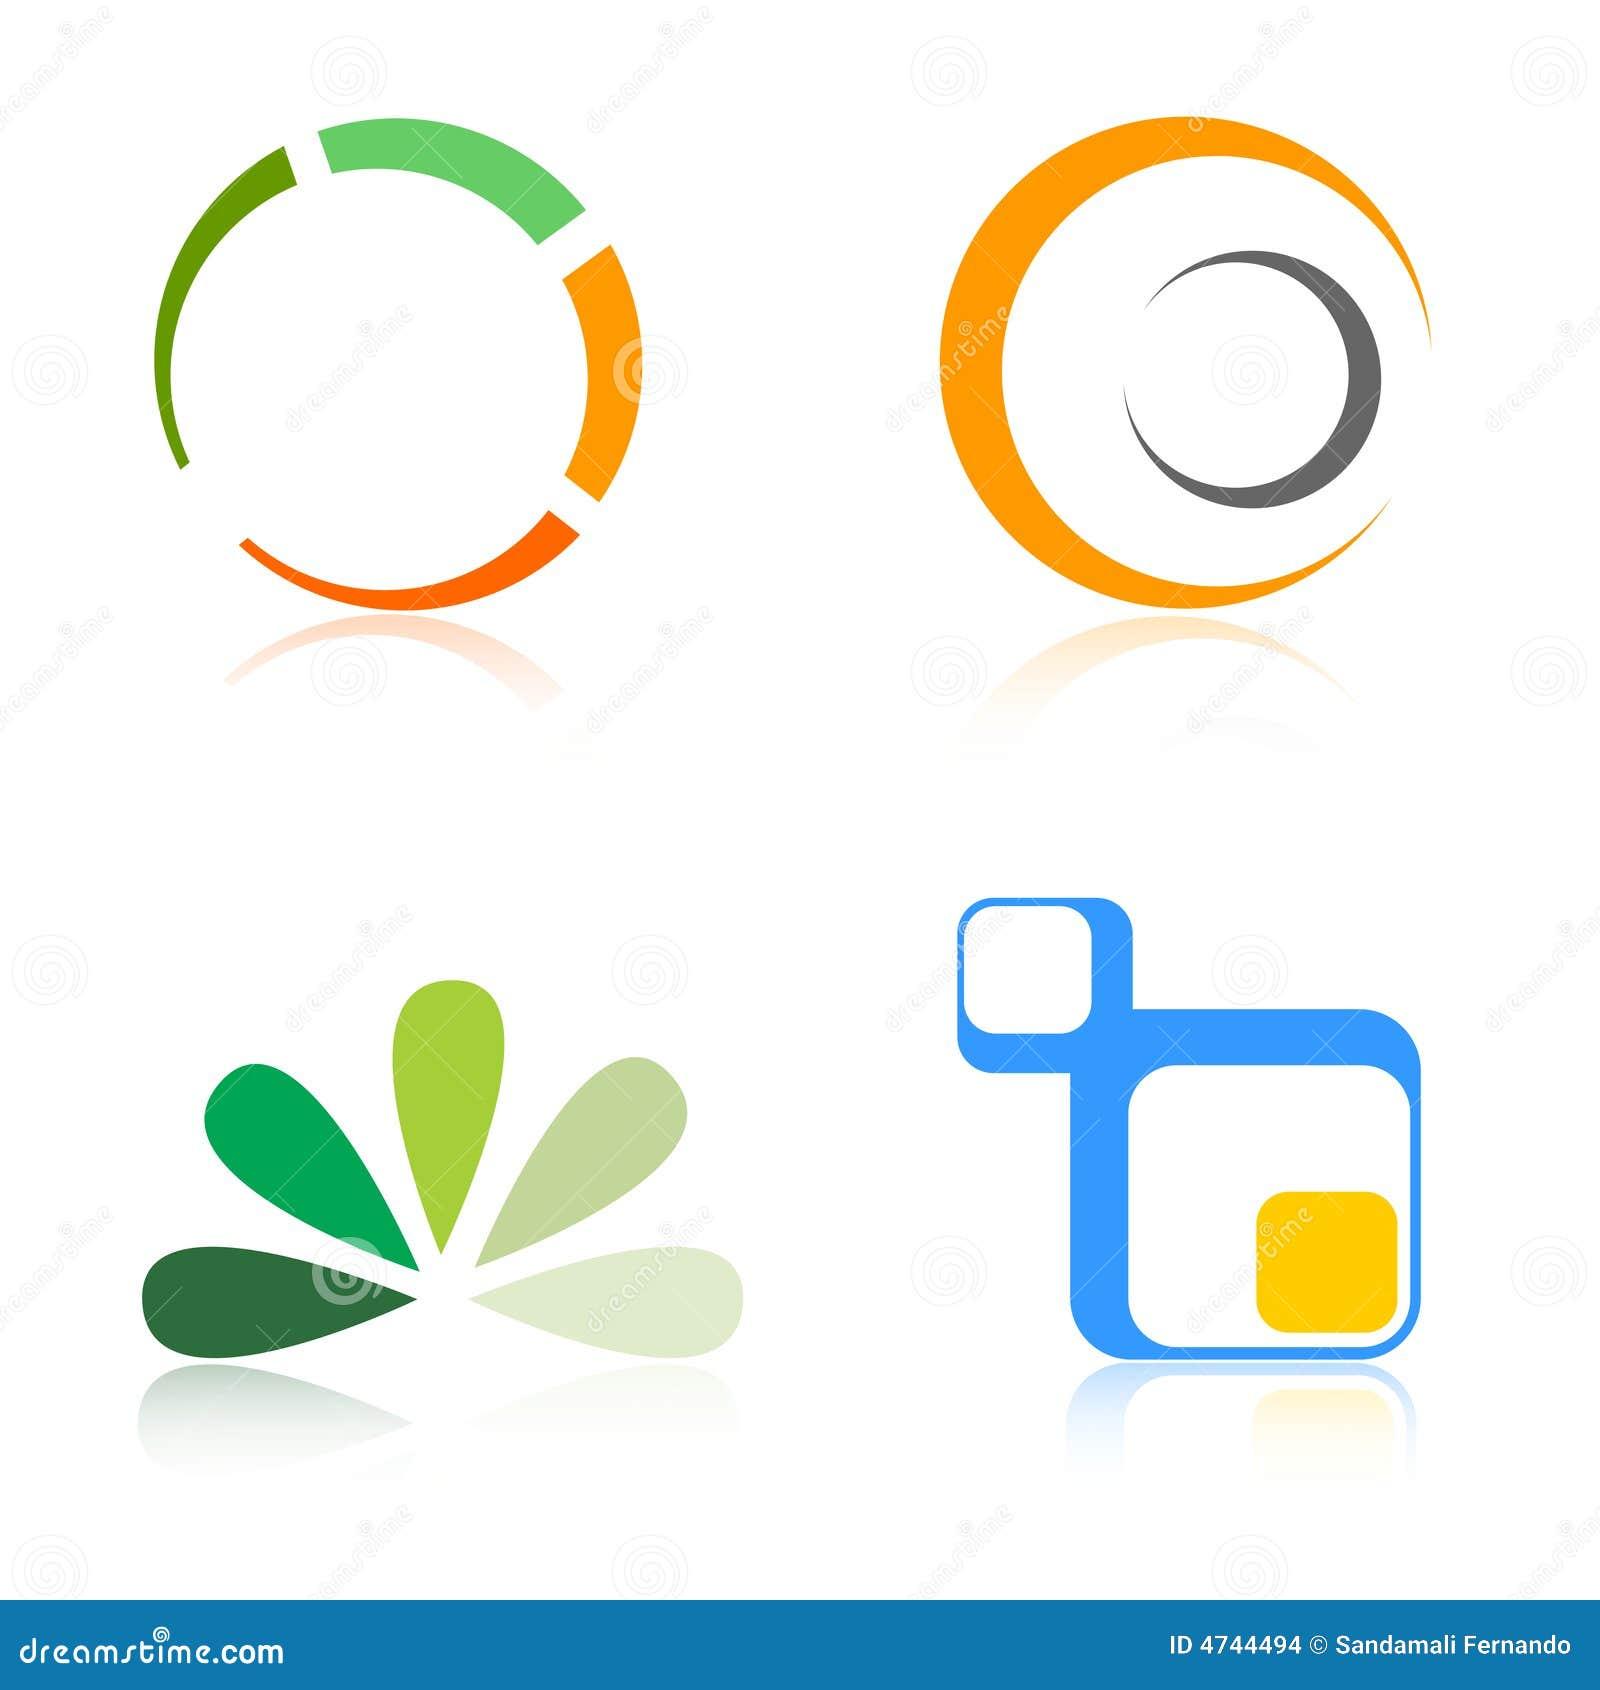 Company logos logo elements stock vector illustration of idea download comp voltagebd Gallery